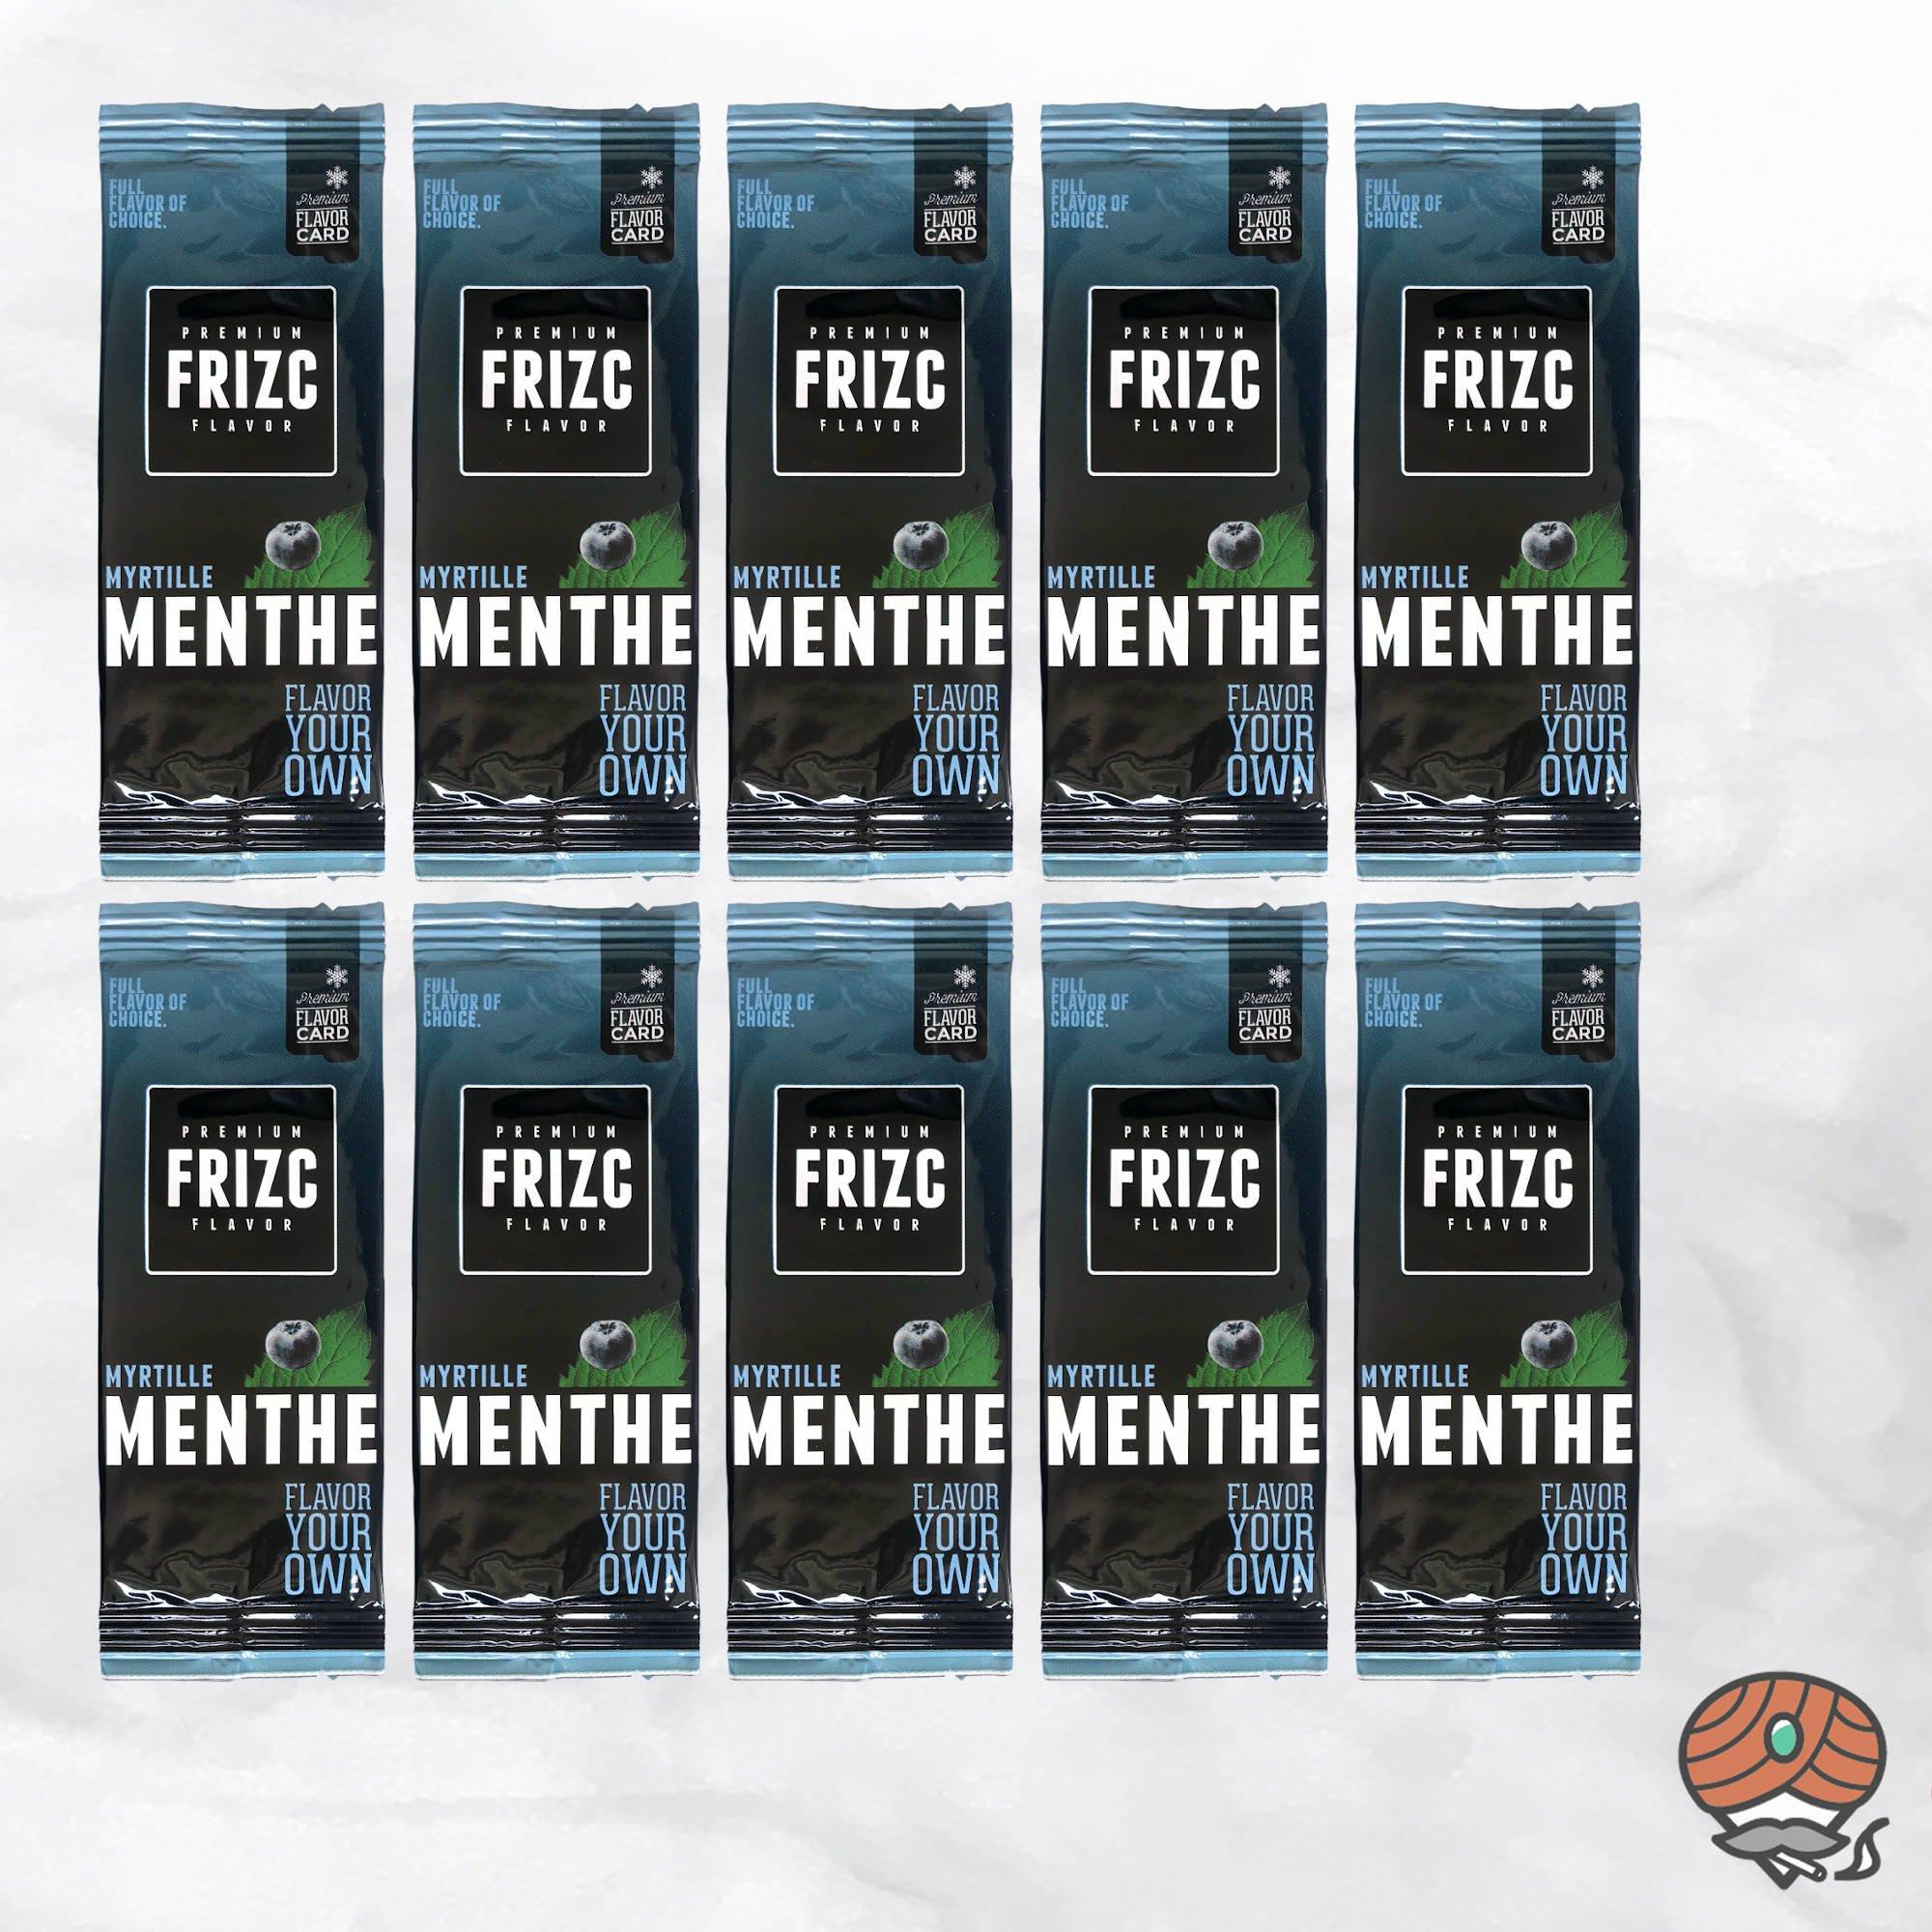 10 x Aromakarte Frizc Menthe & Myrtille (Menthol & Blaubeere) - Premium Flavor Card